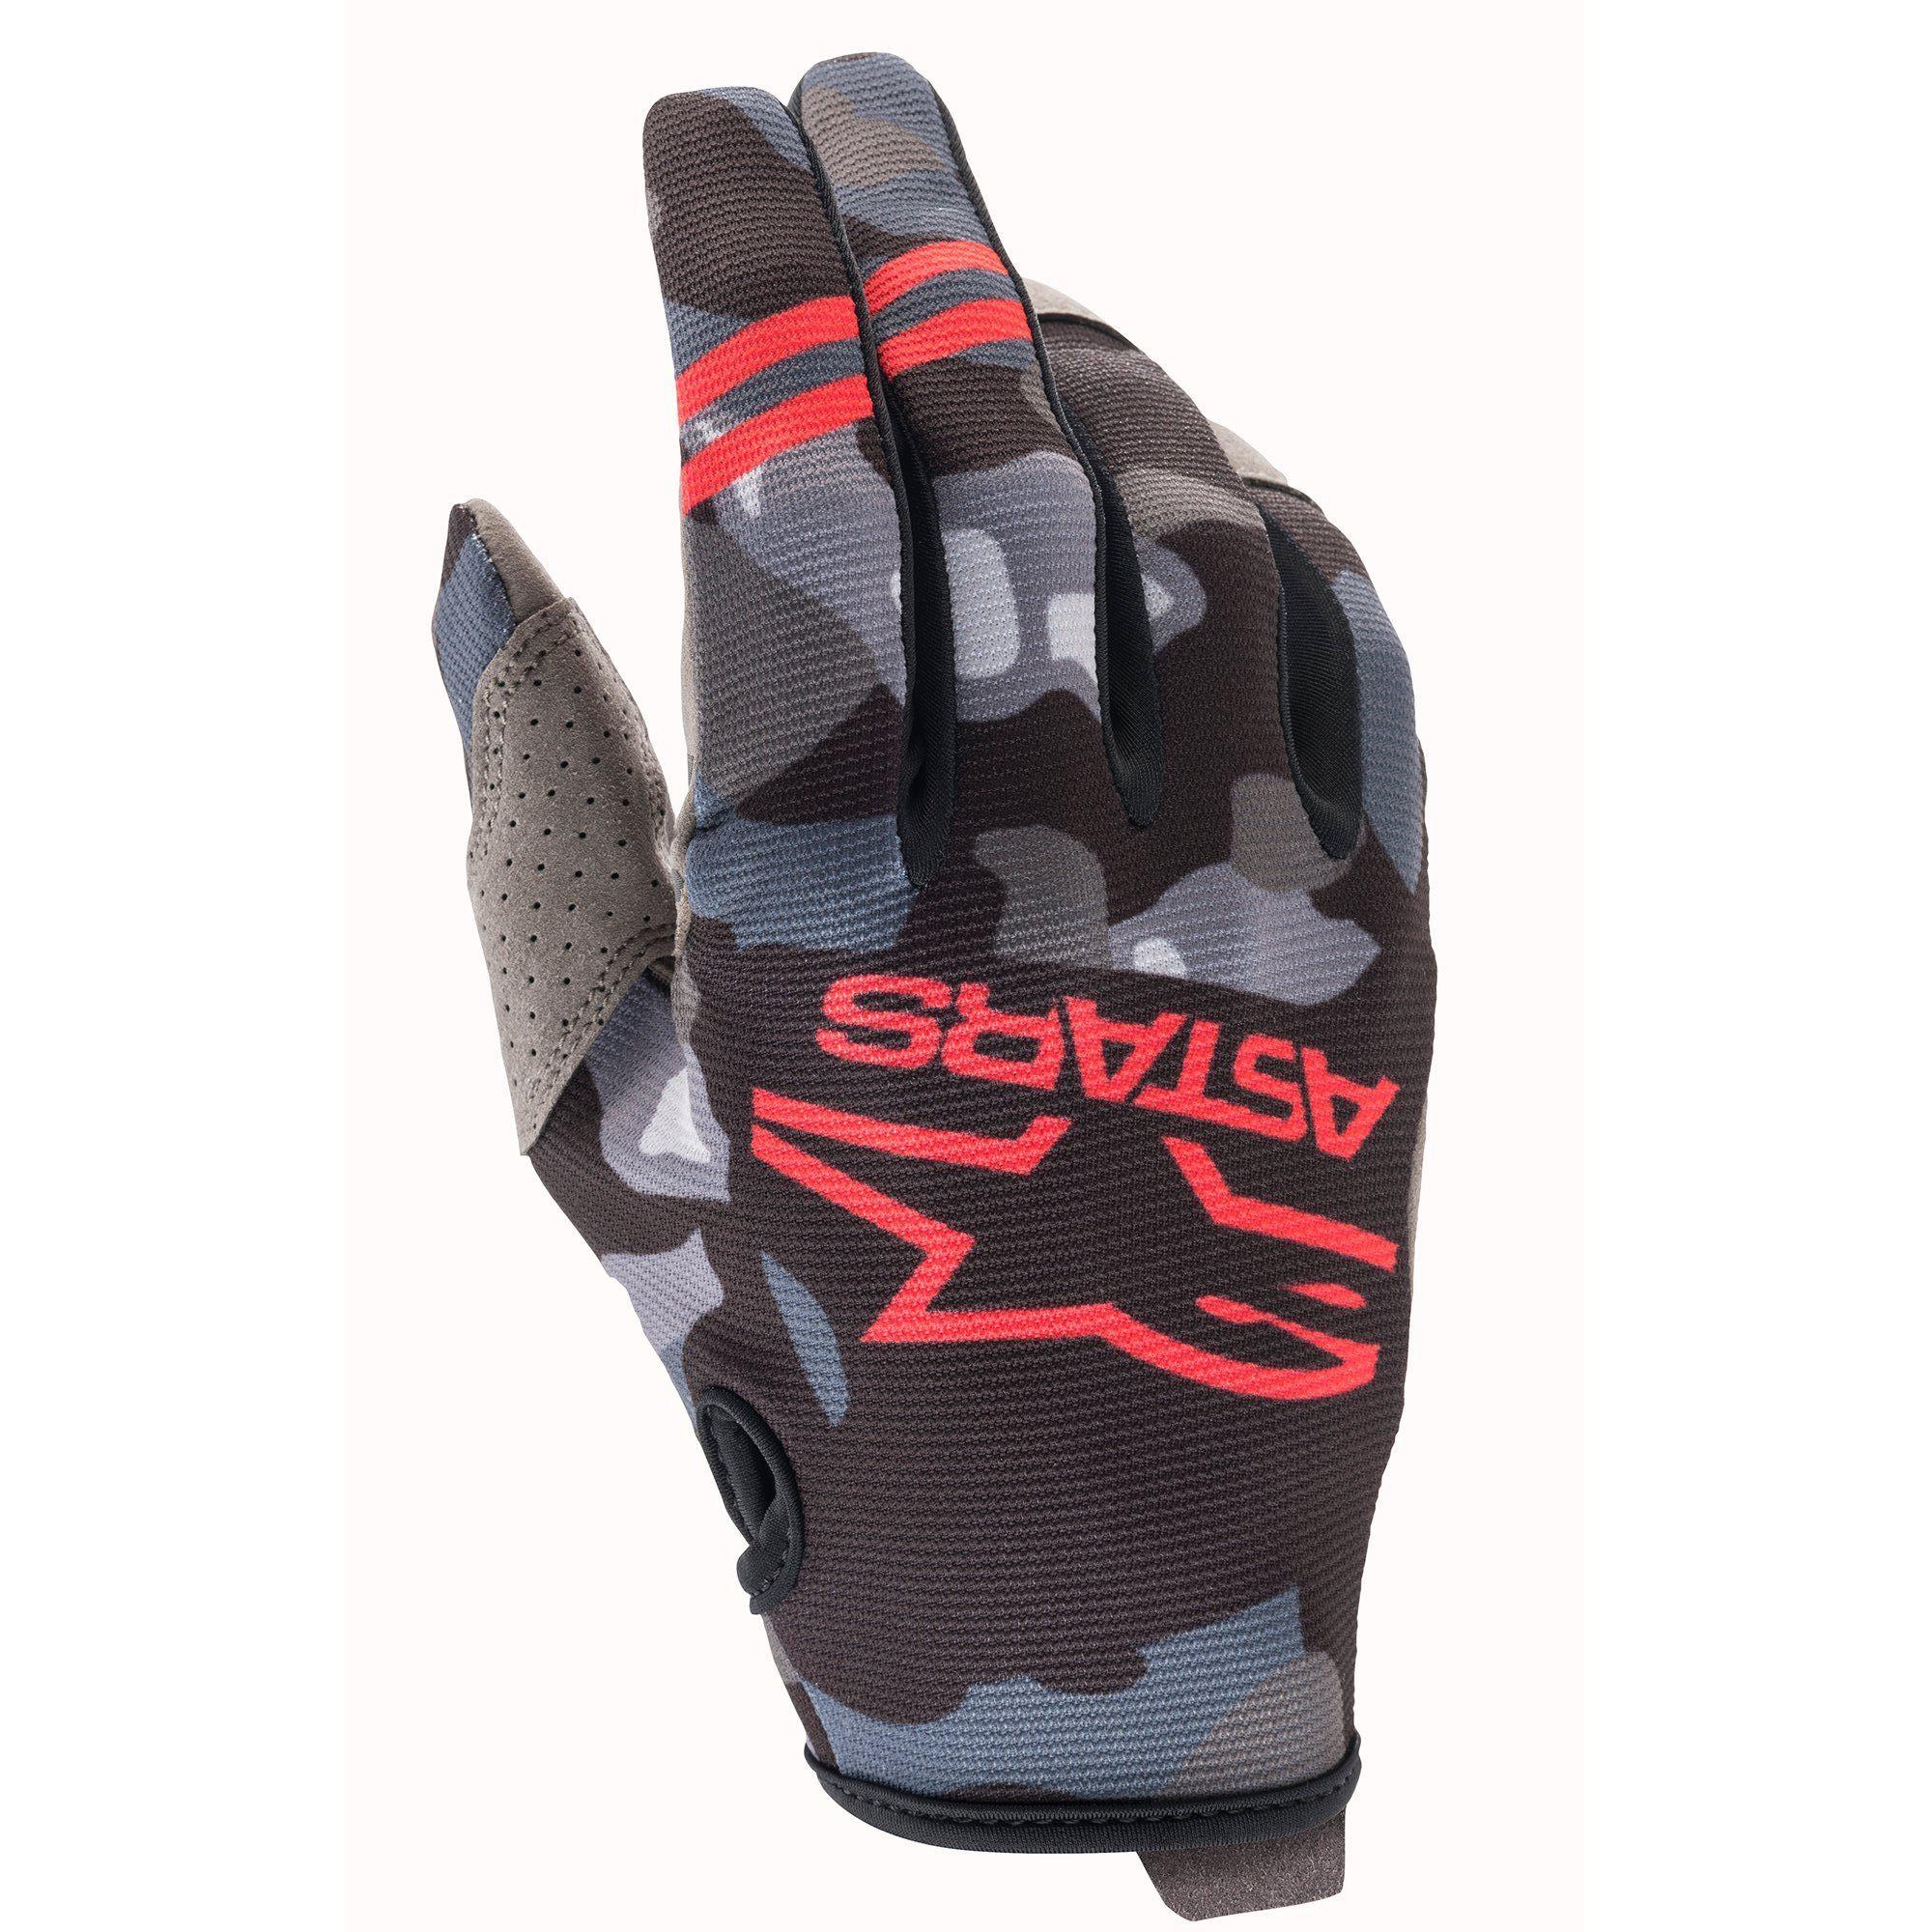 Alpinestars 2021 Radar Grey/Camo/Red Gloves